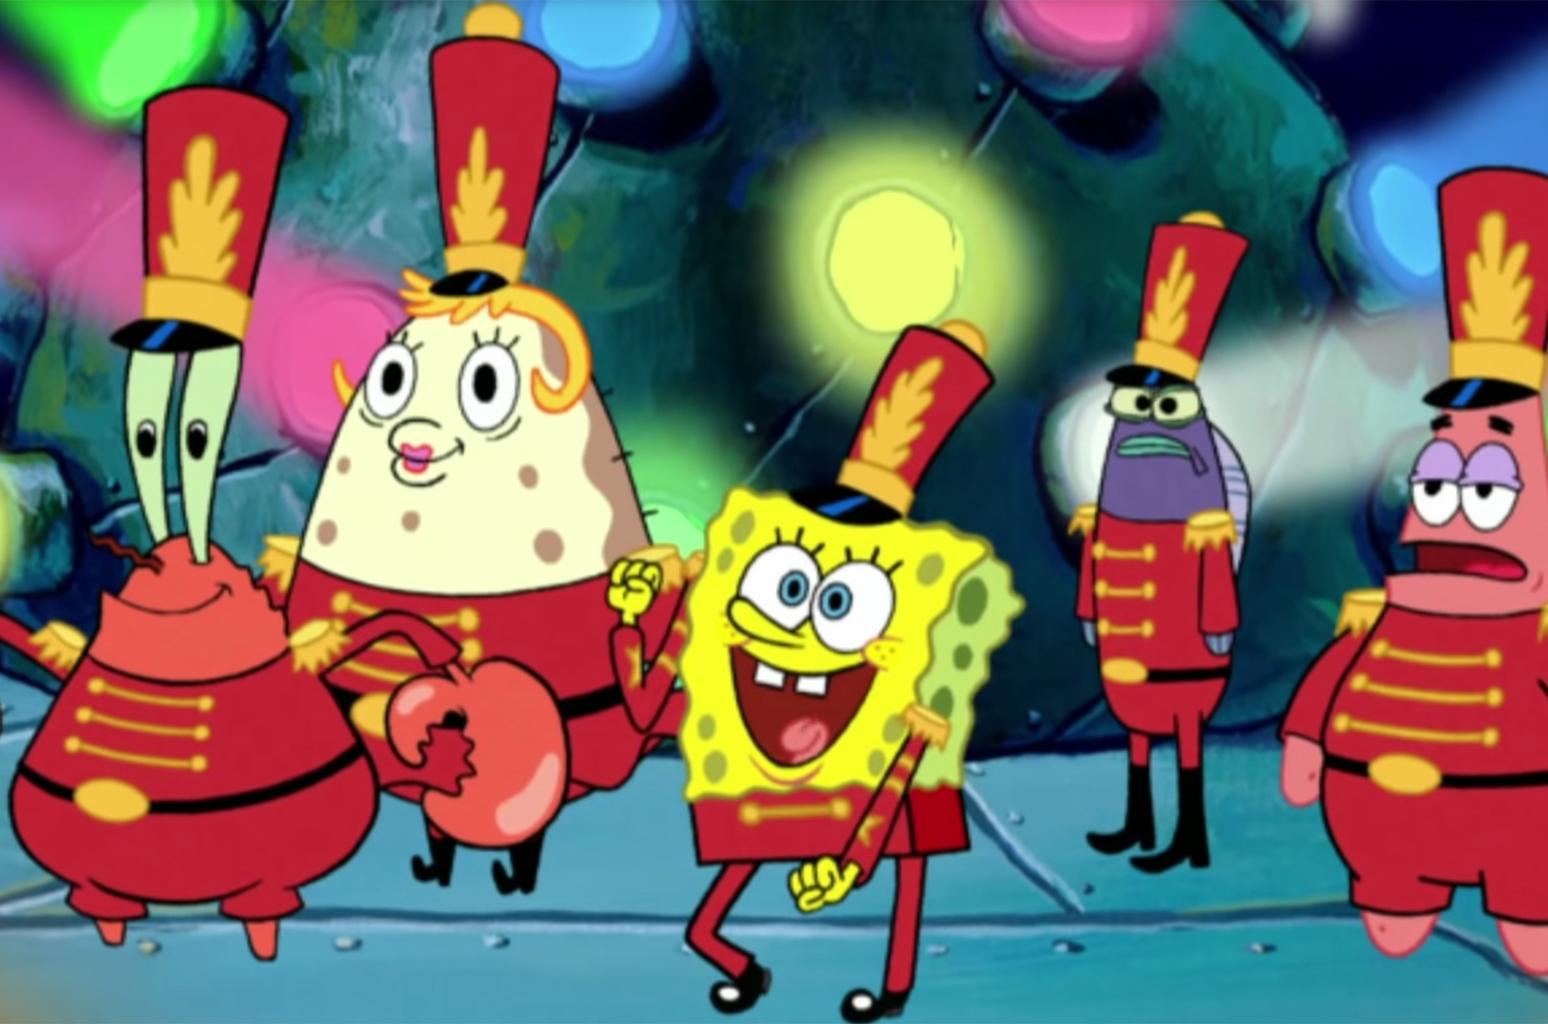 Spongebob Squarepants' 'sweet Victory' Jumps 566% In Streams with Super Bowl Sweet Victory